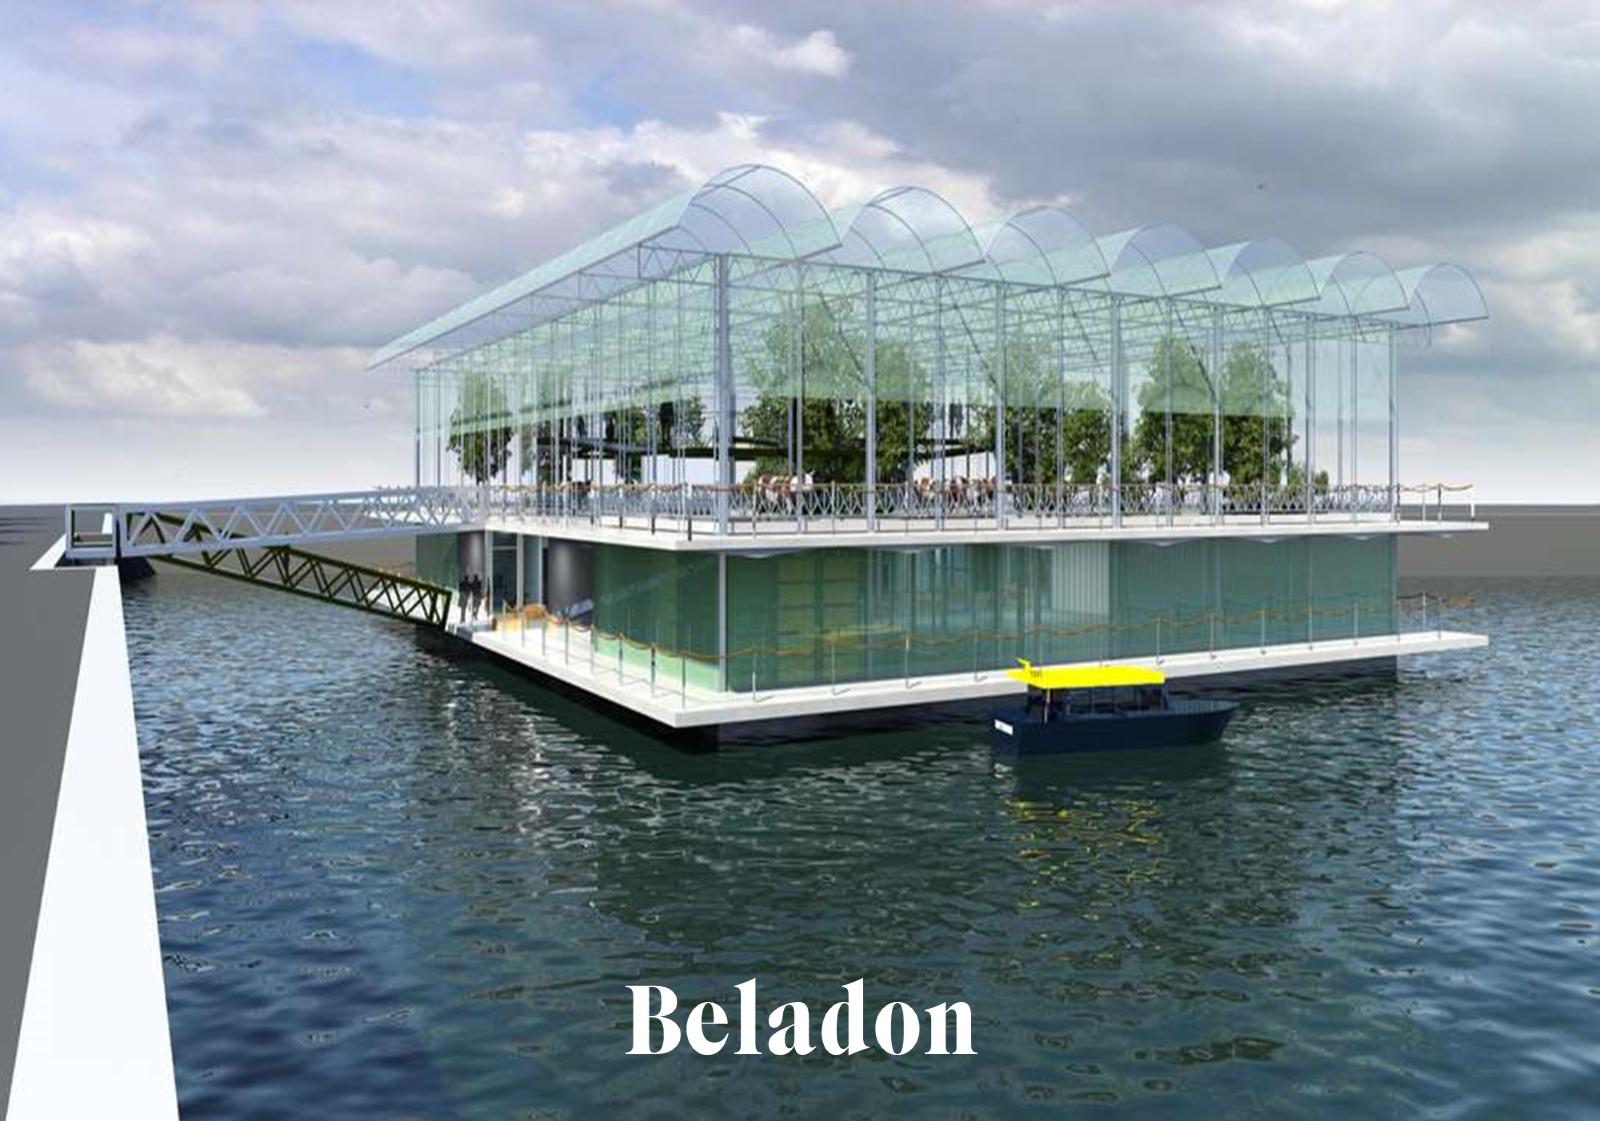 rotterdam-ferme-flottante